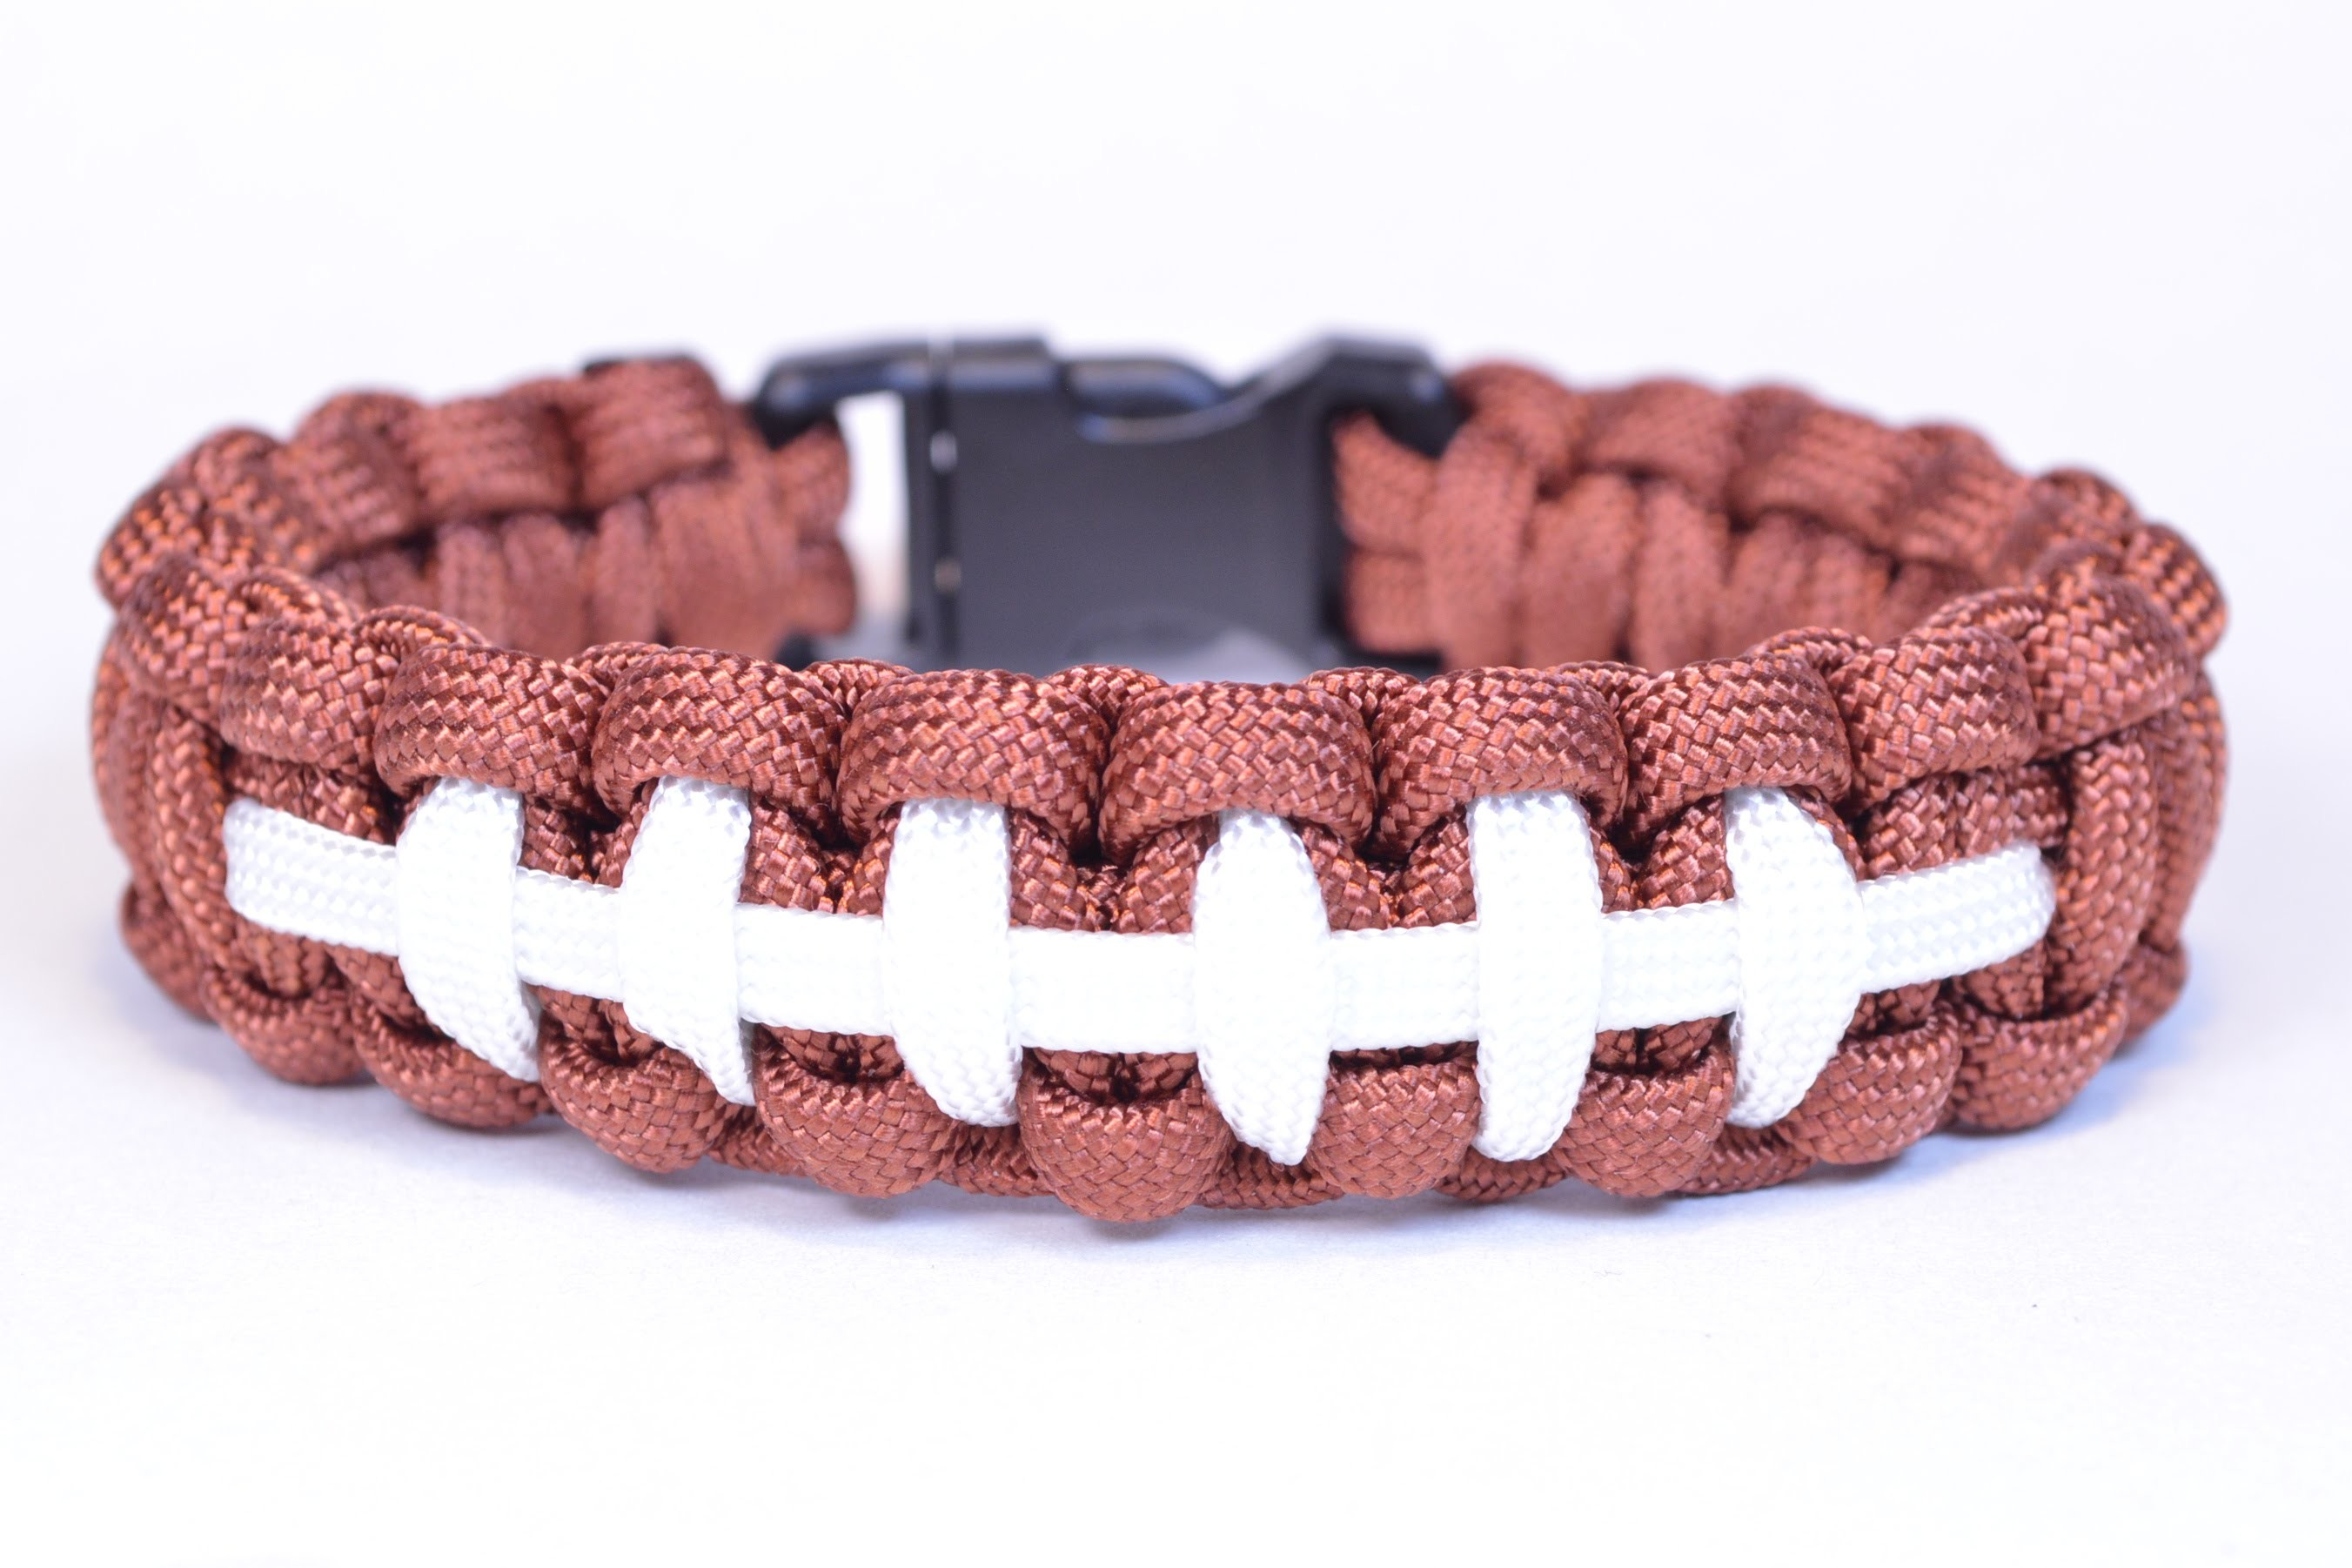 Make a Football Themed Paracord Survival Bracelet - BoredParacord